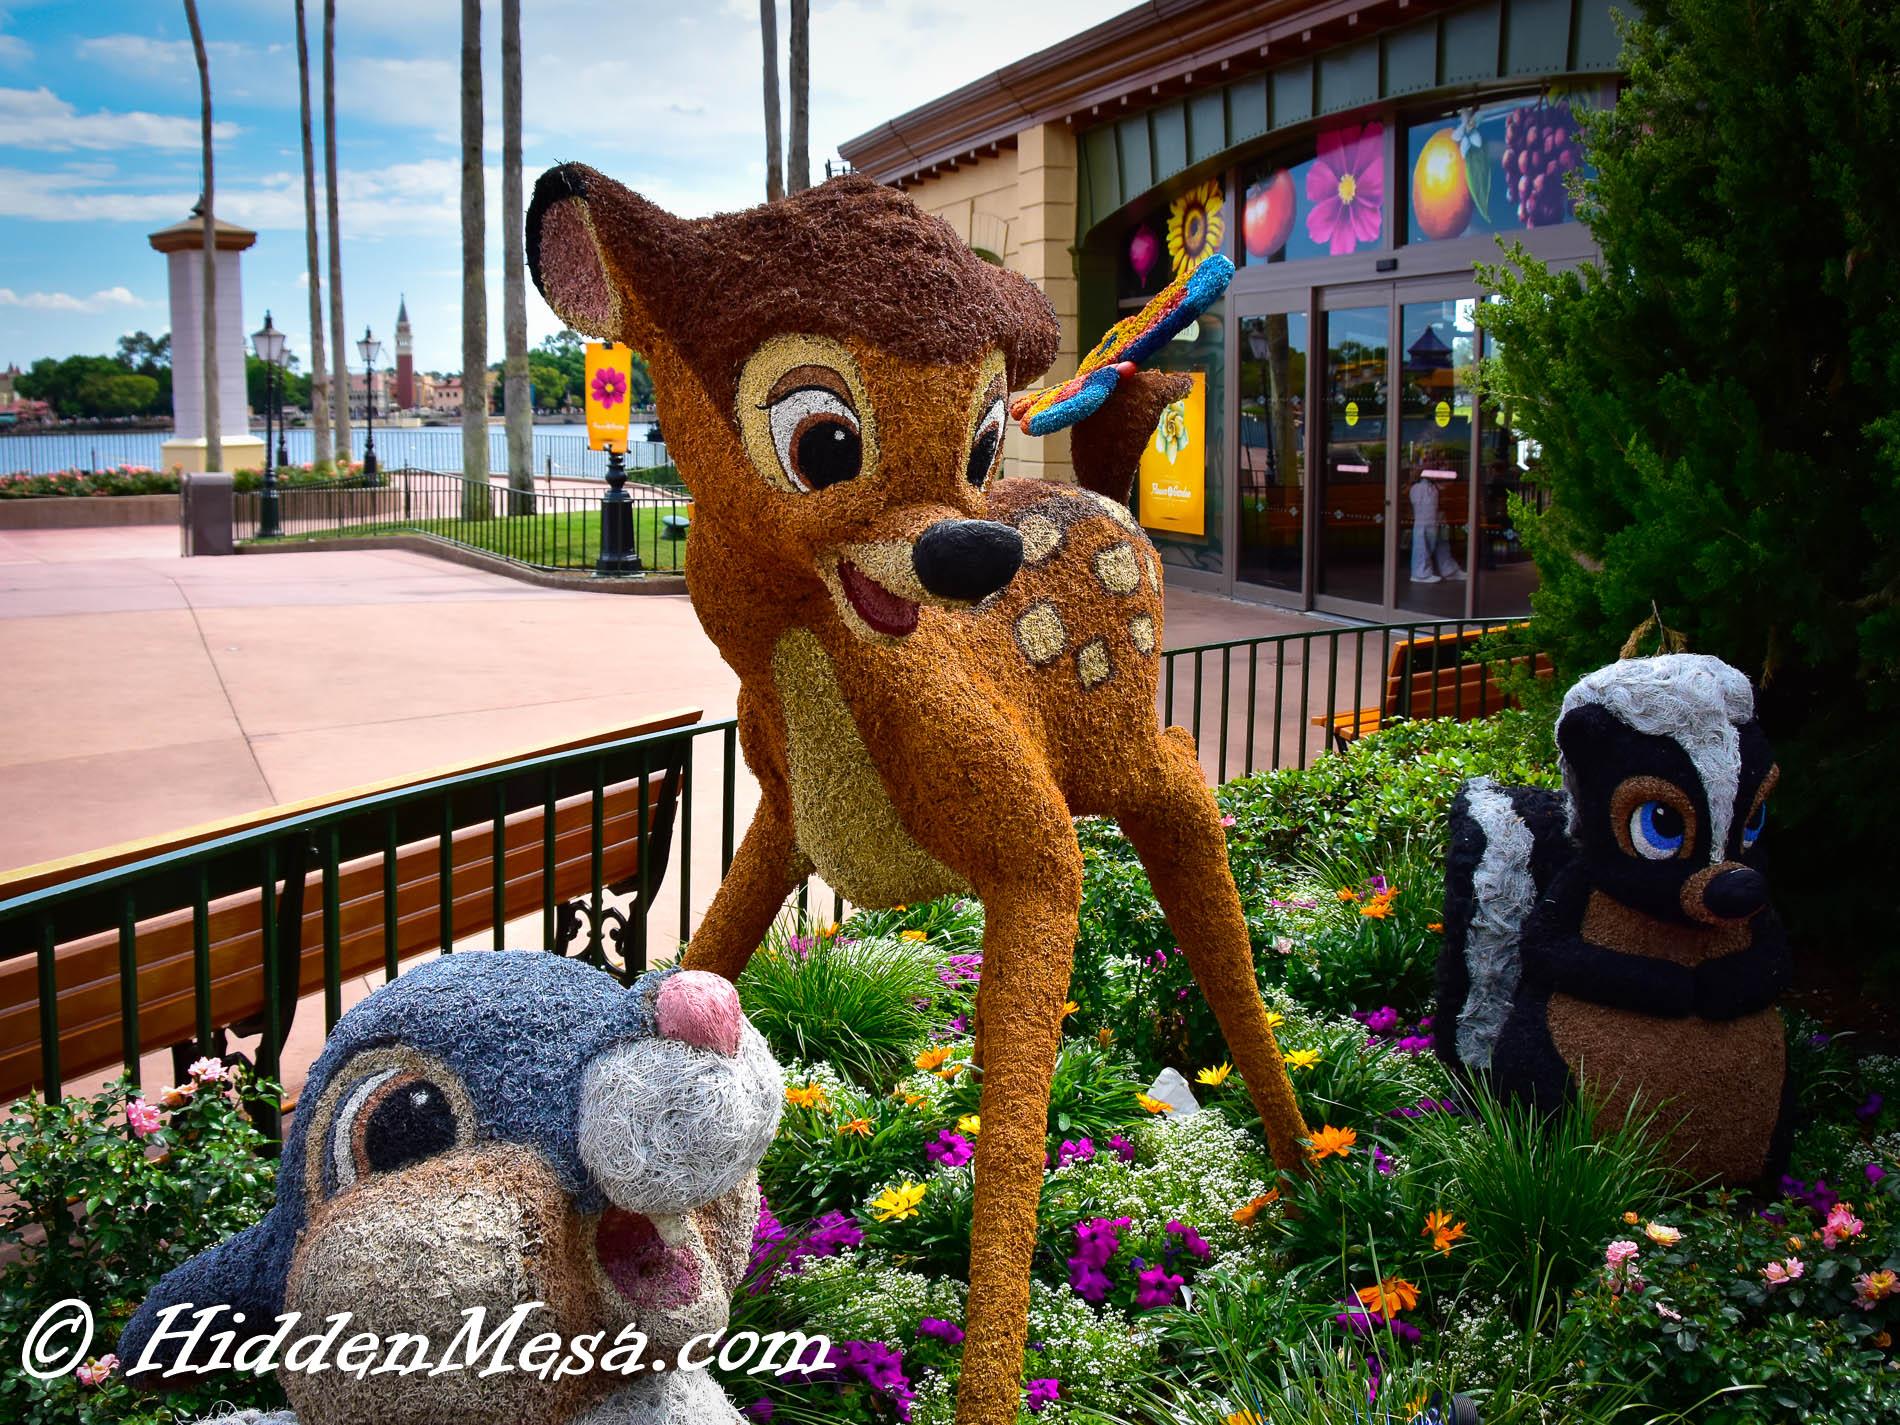 Bambi,Thumper, and Flower